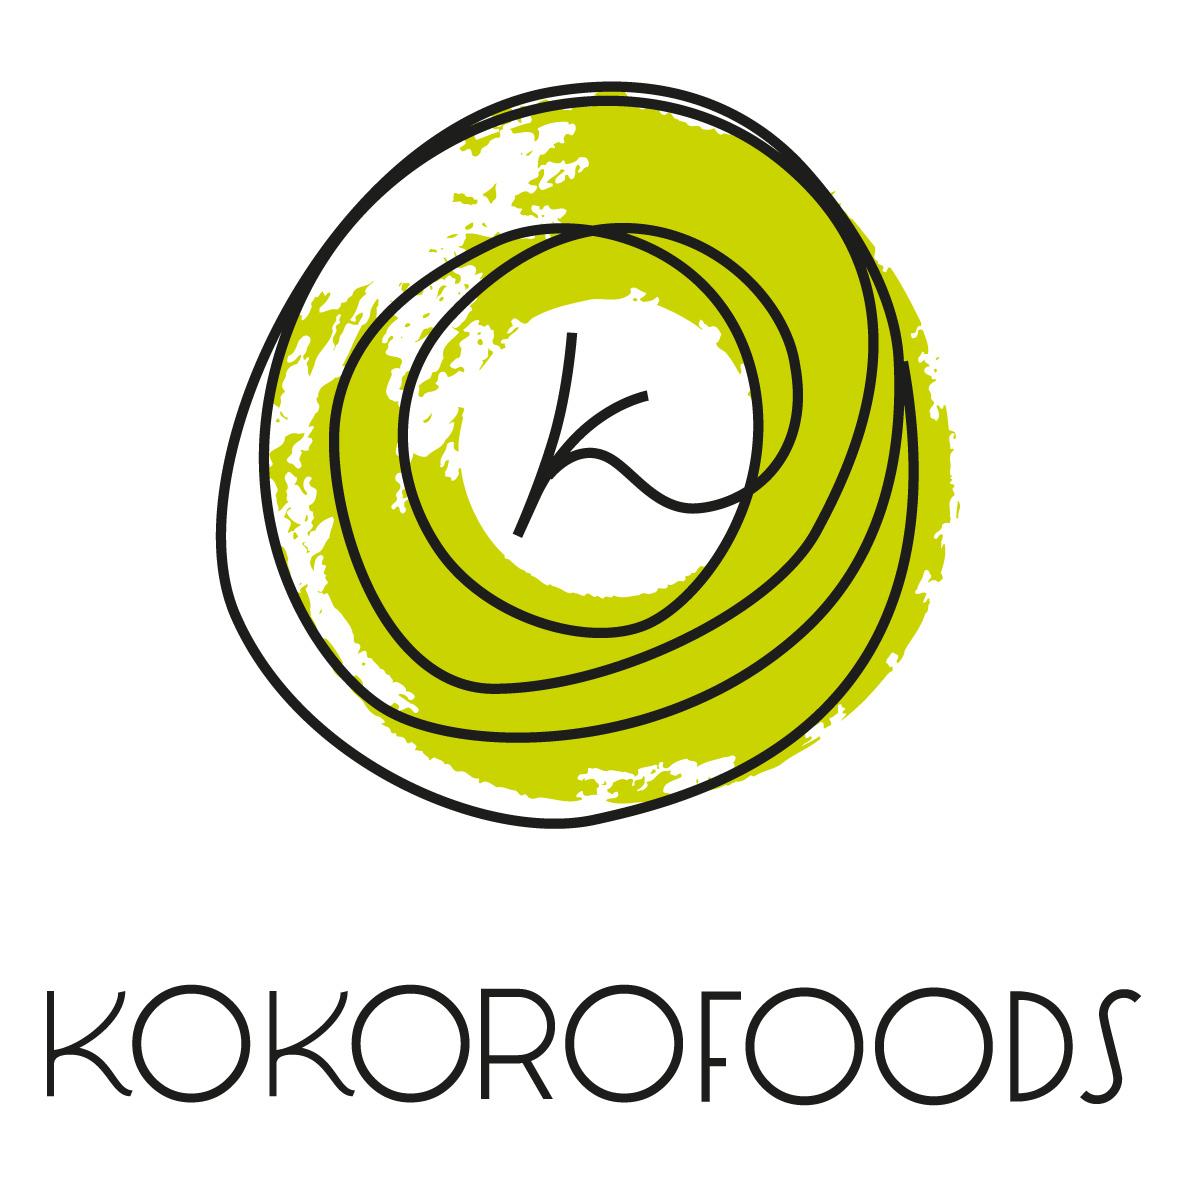 Empresas Desafio10x: Agrícola Kokorofoods limitada